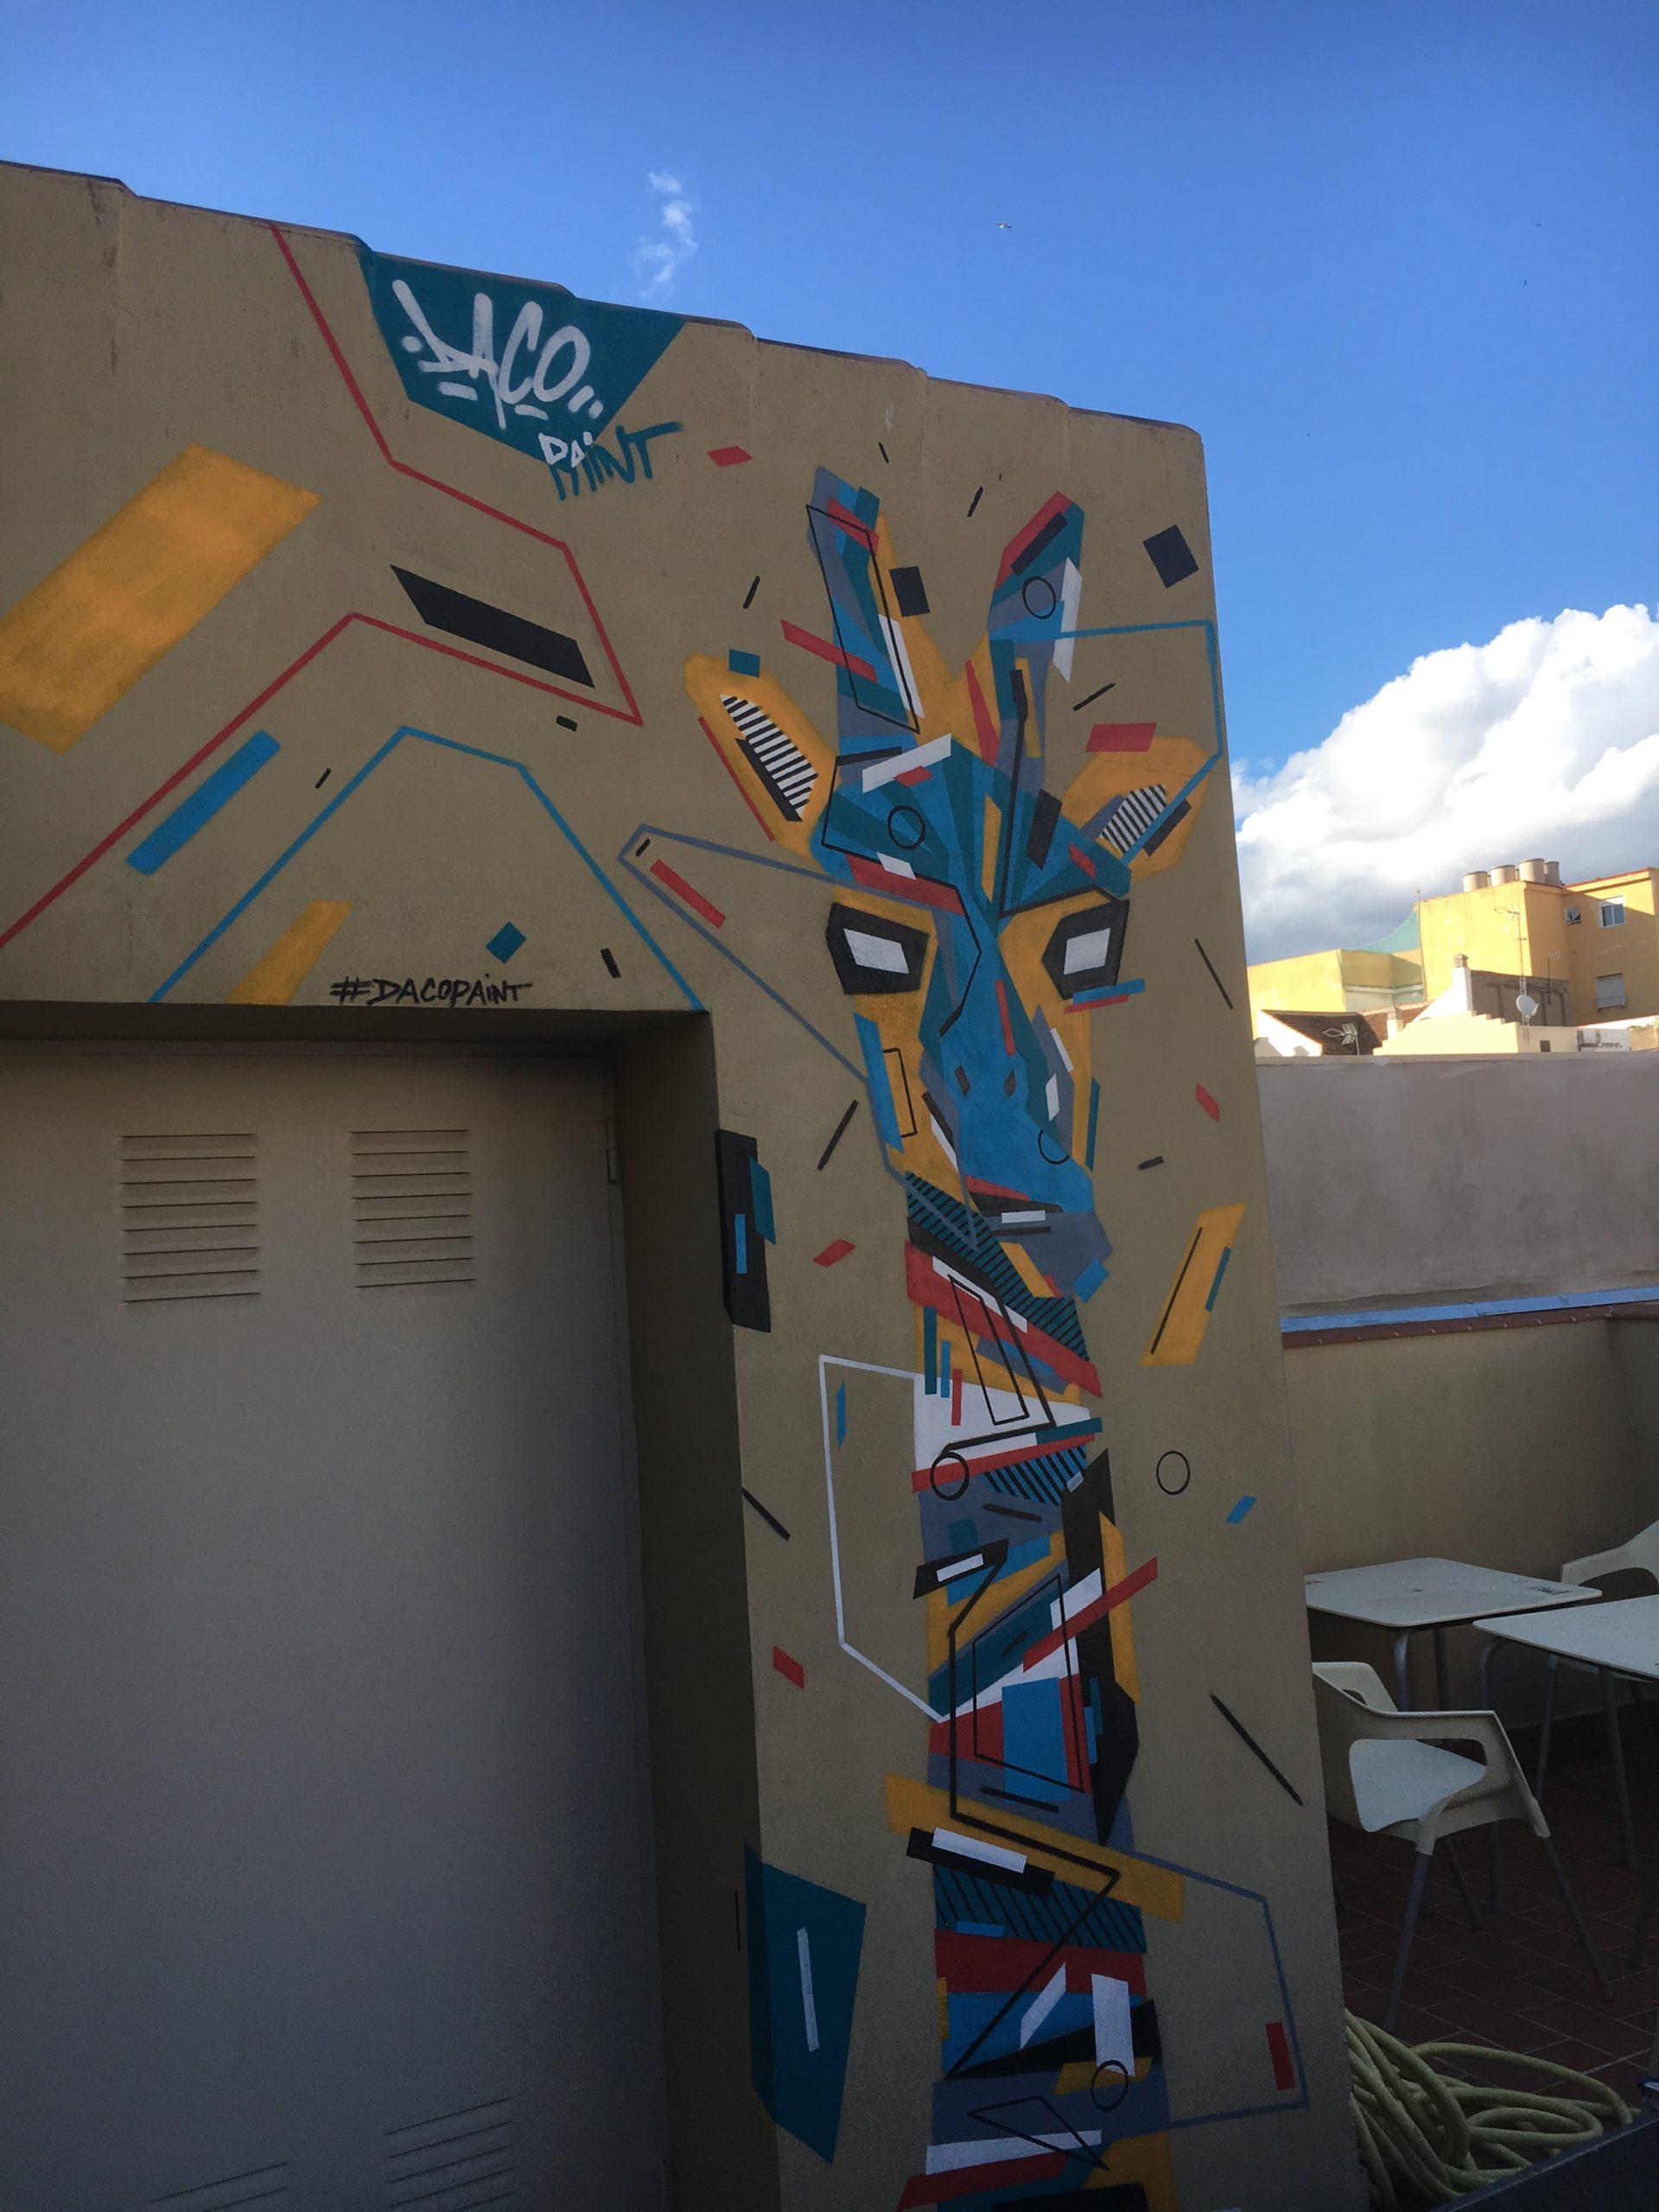 Fresque Graffaune Graffiti girafe réalisée par Daco